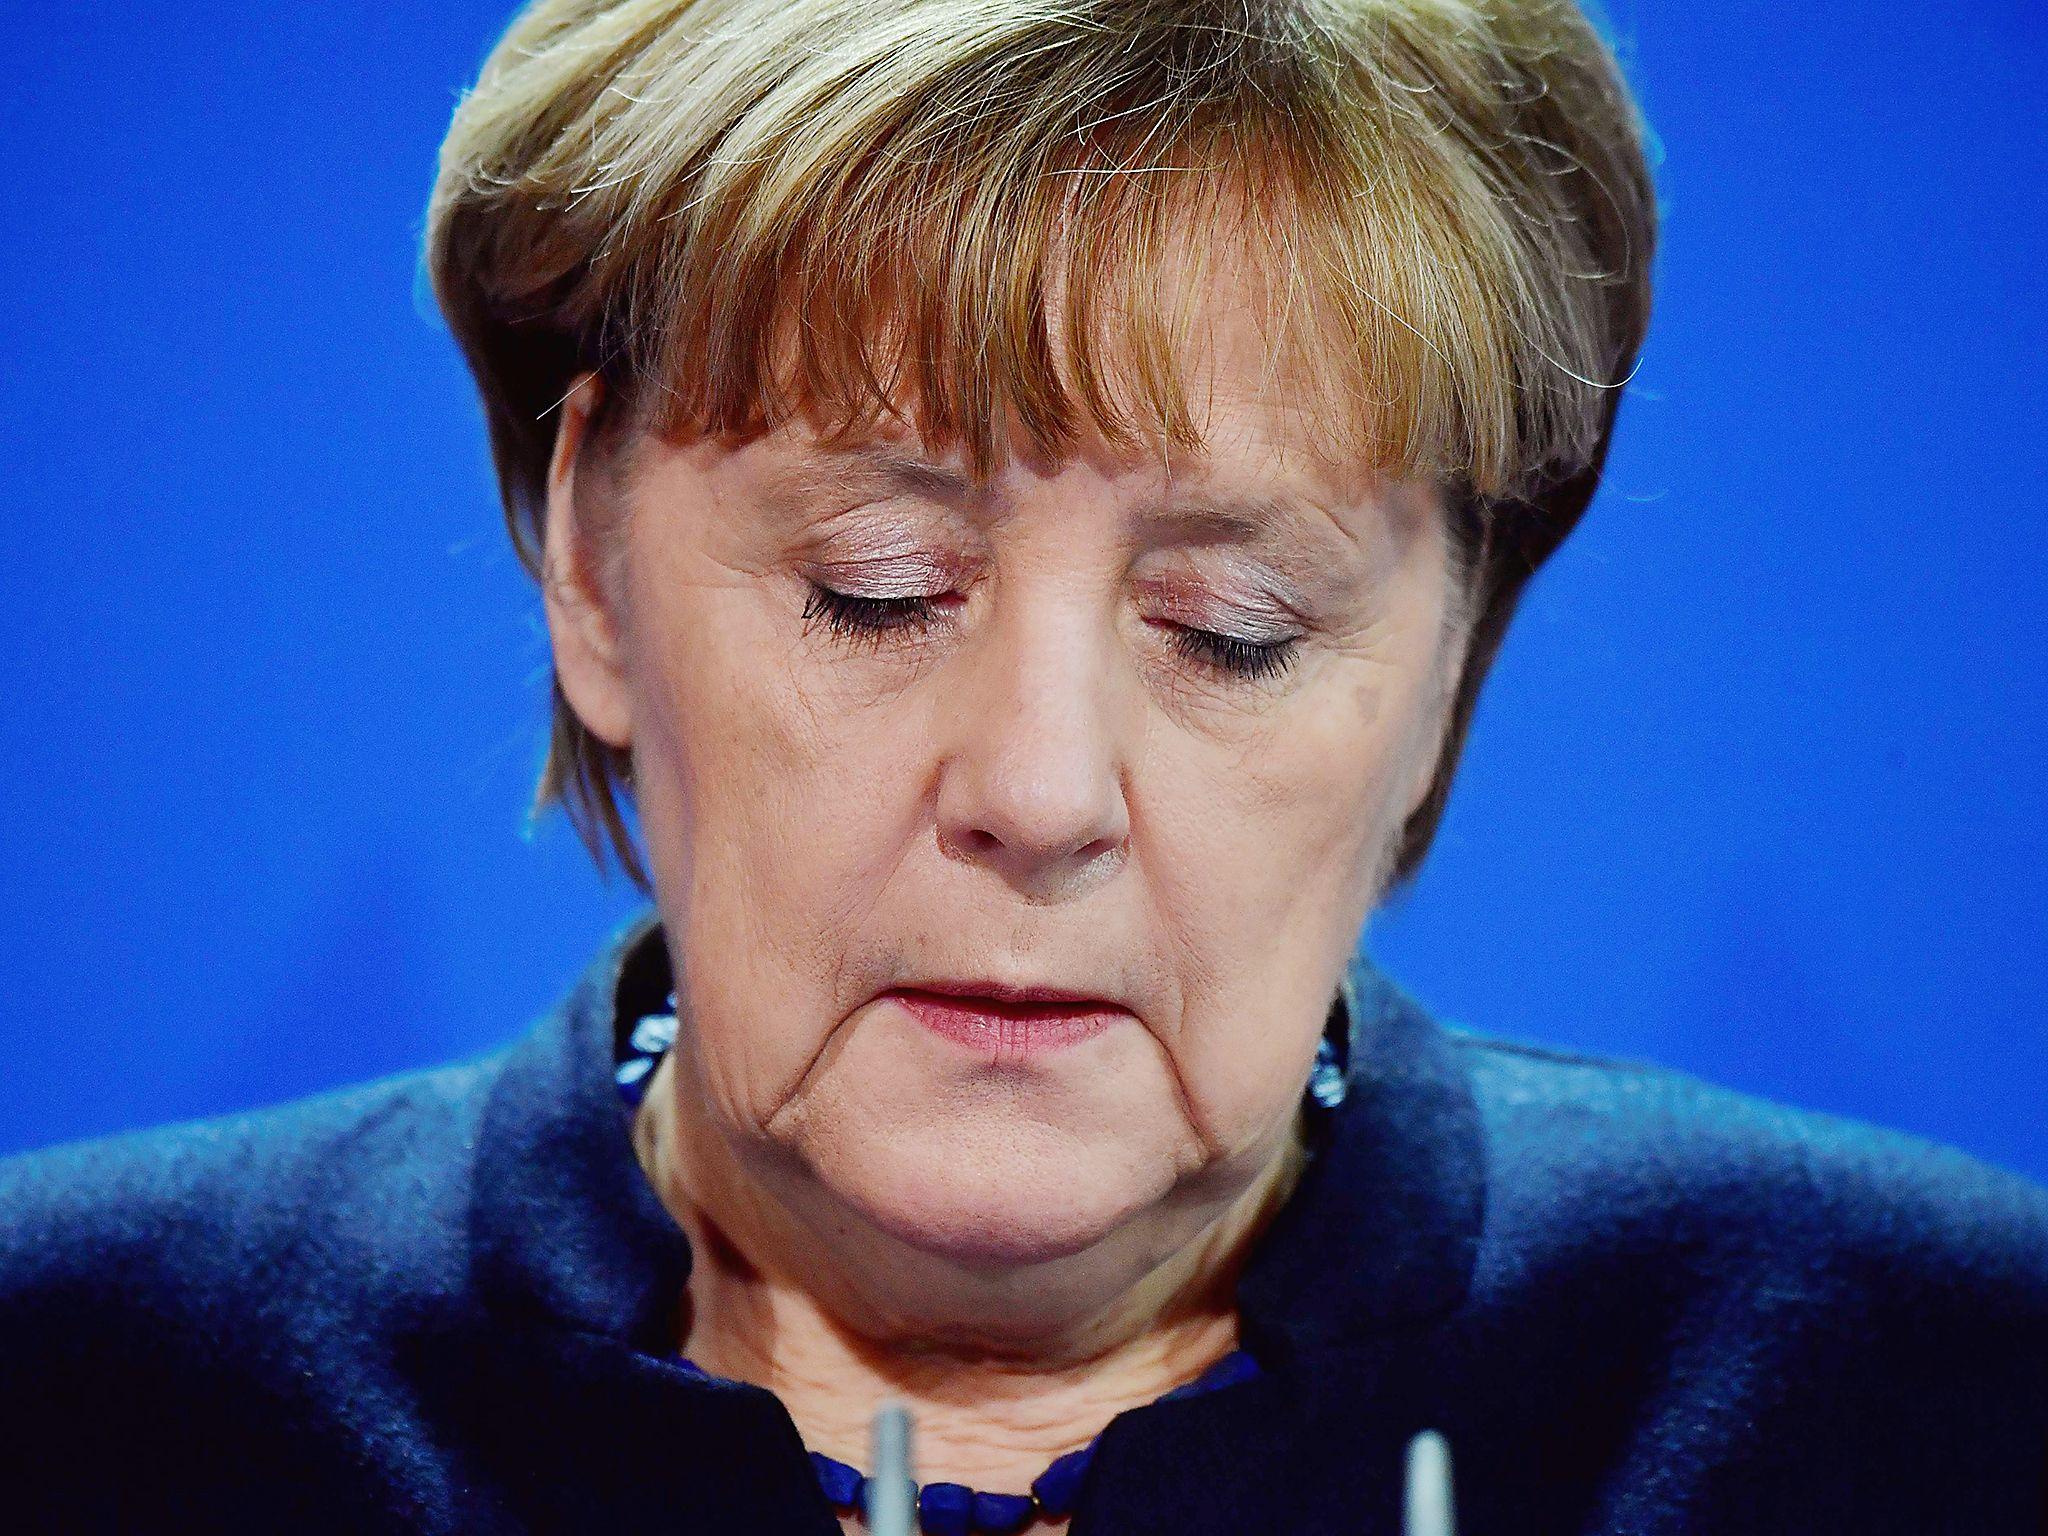 Germania, Angela Merkel prepara il suo ritiro